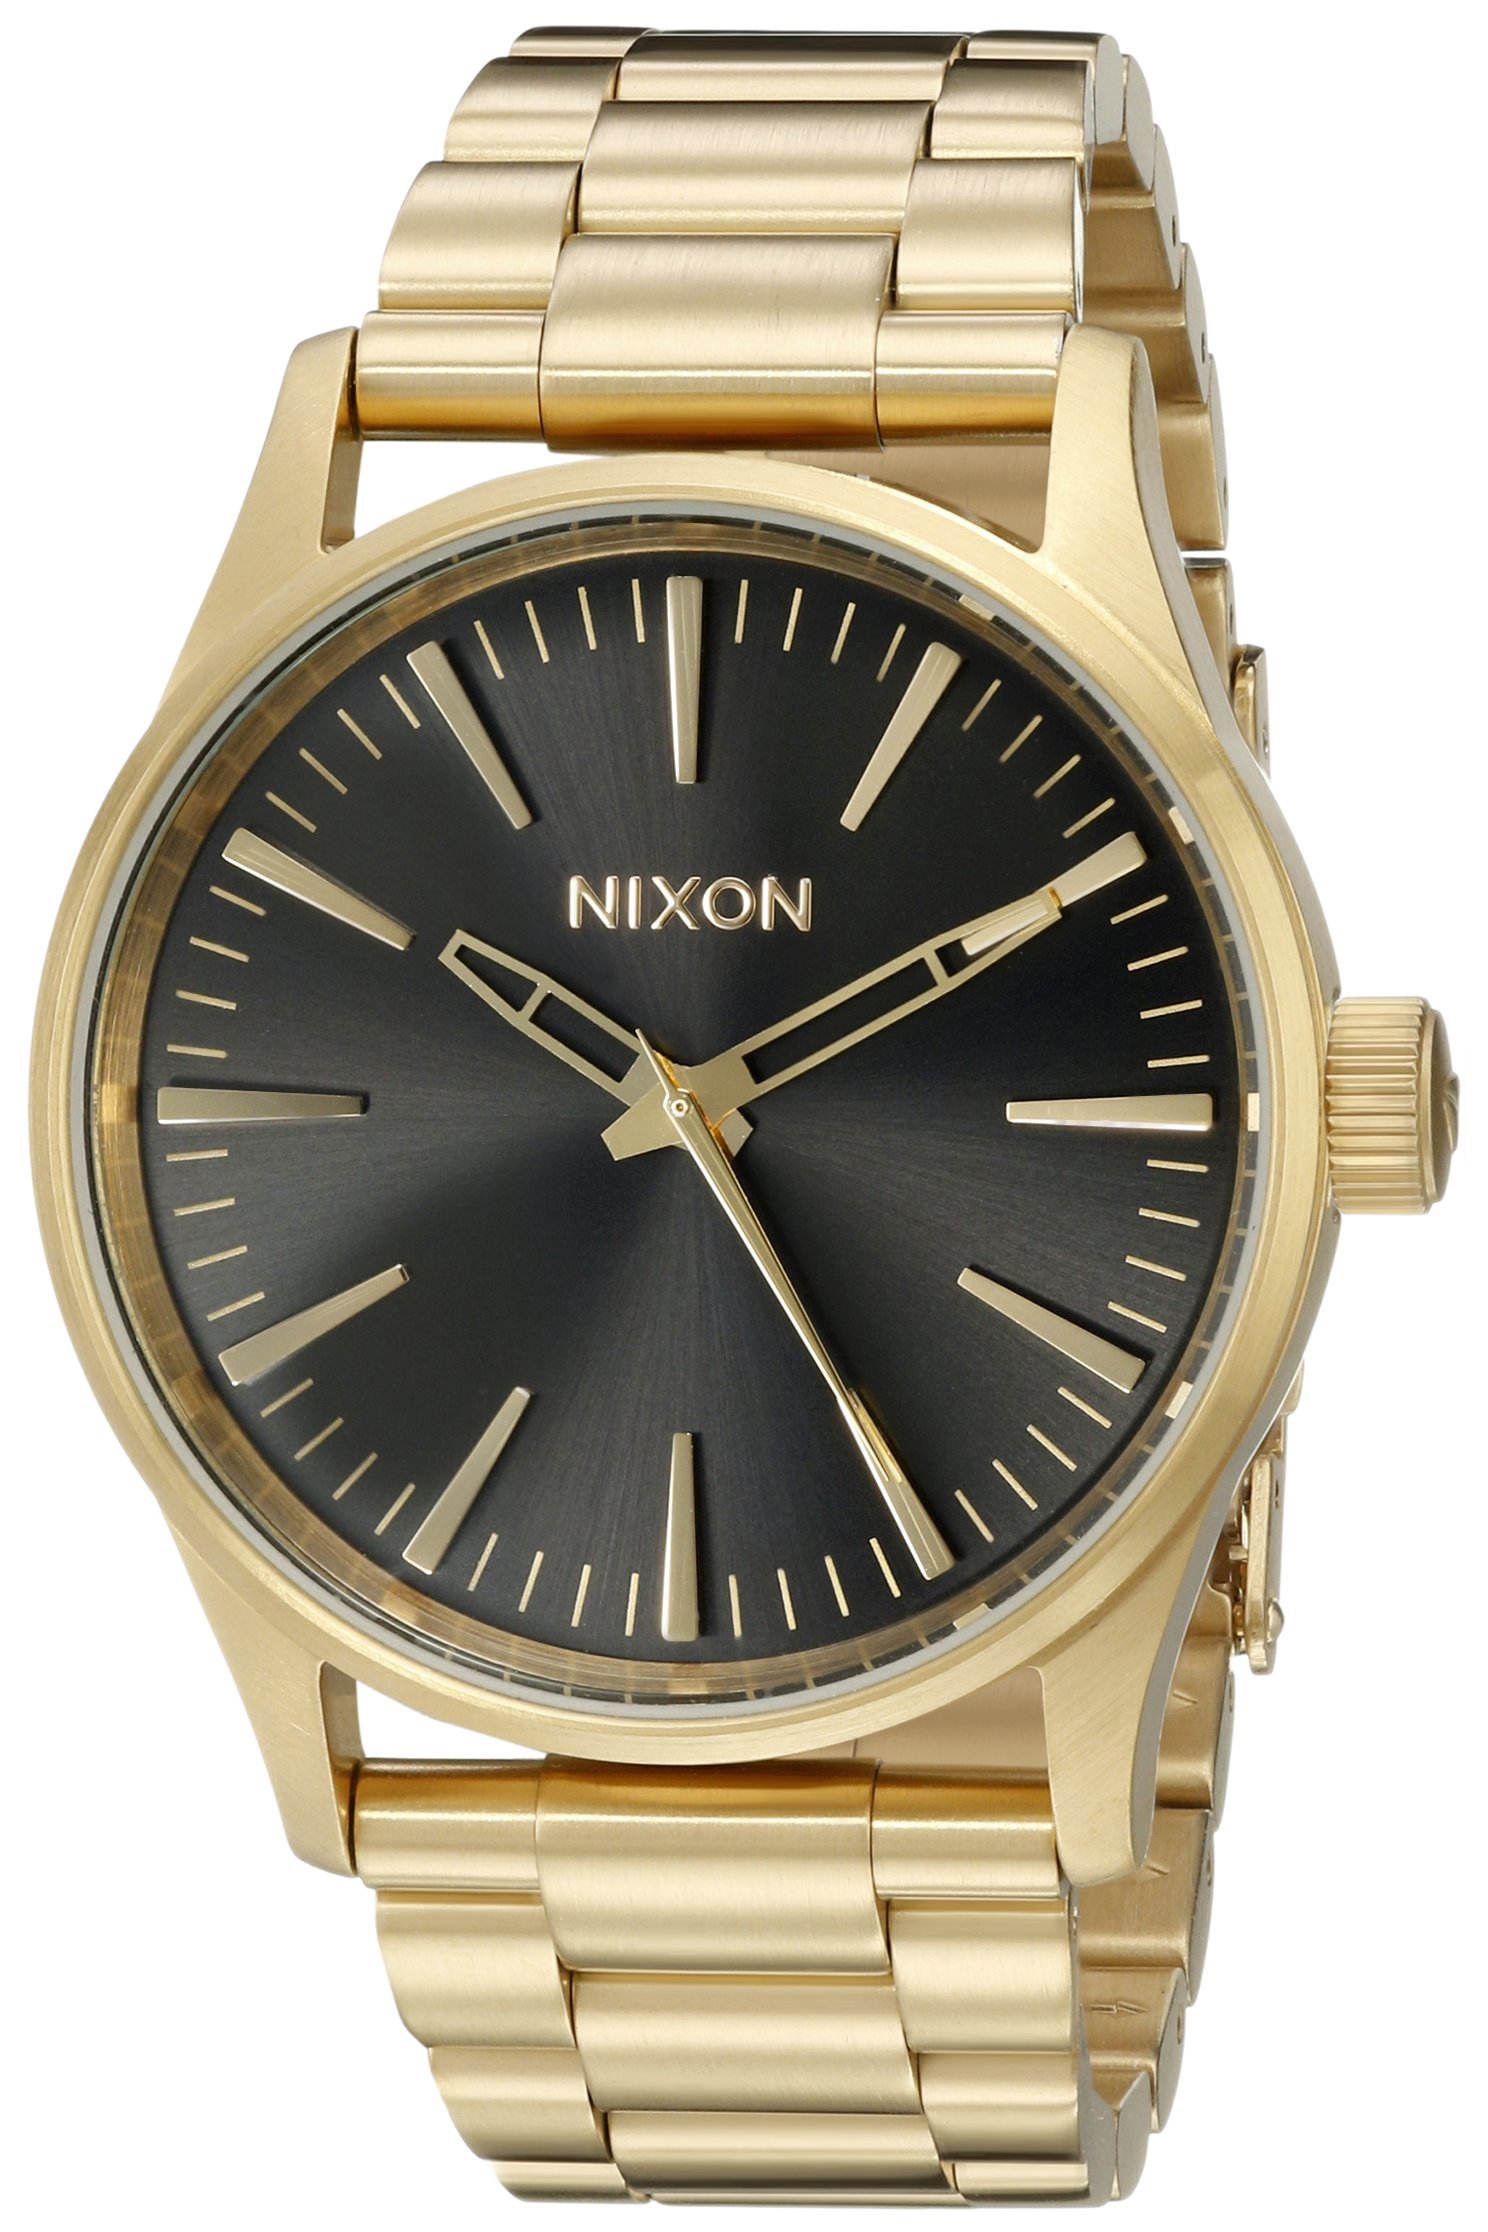 Nixon Men's A4501604 Sentry 38 SS Analog Display Analog Quartz Gold Watch by NIXON